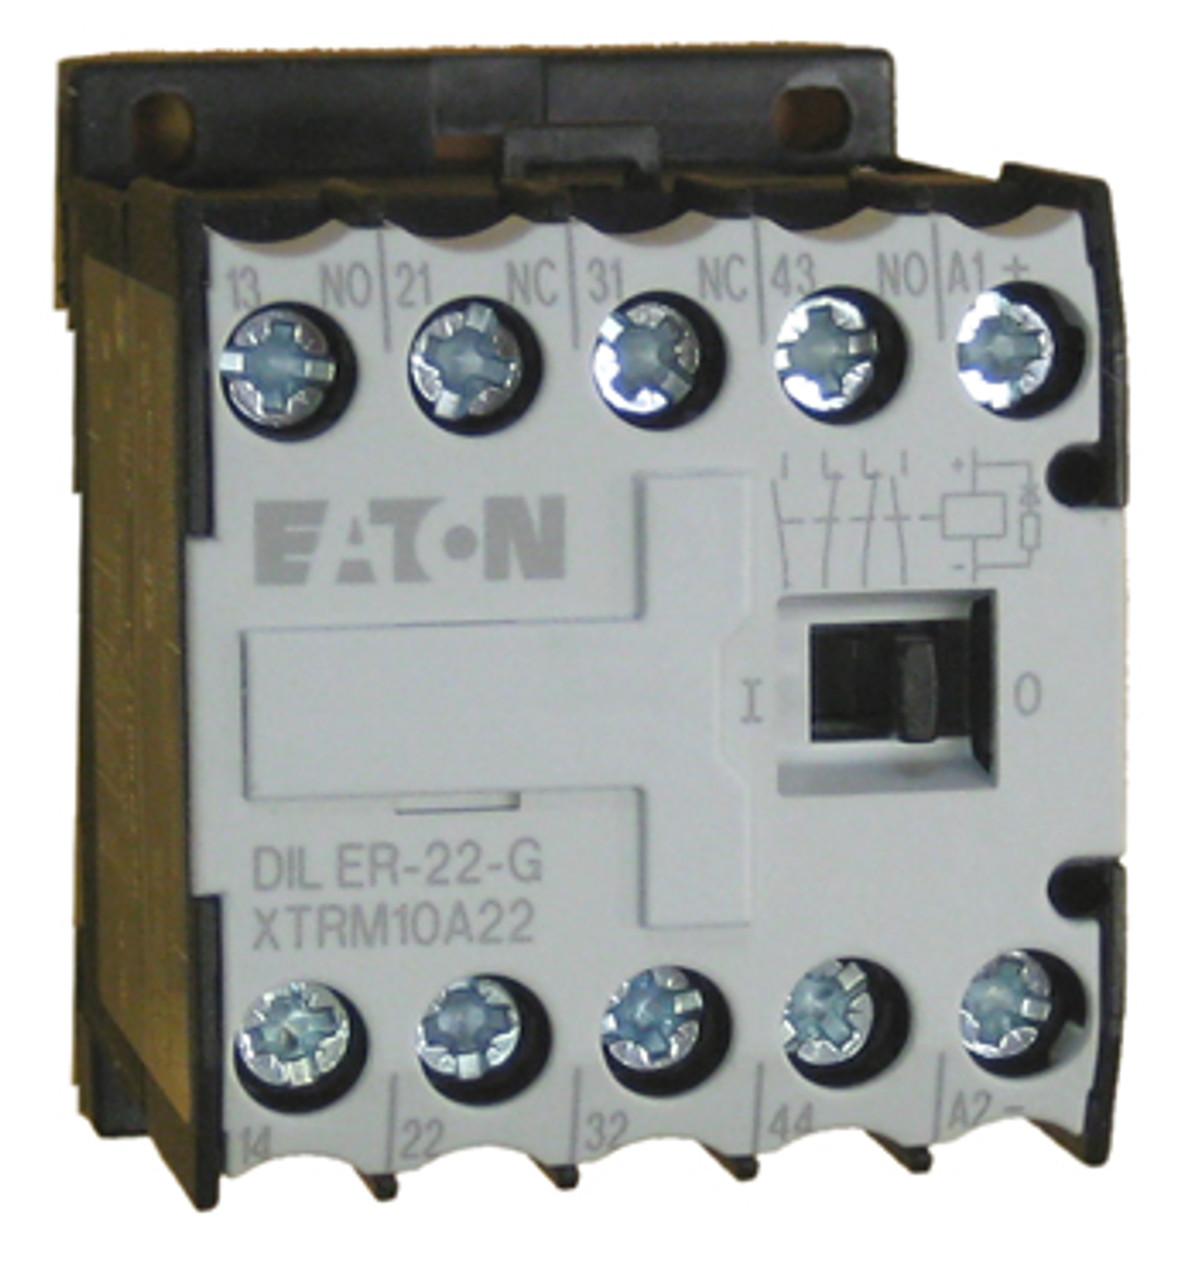 Eaton/Moeller DILER-22 (110vDC) relay